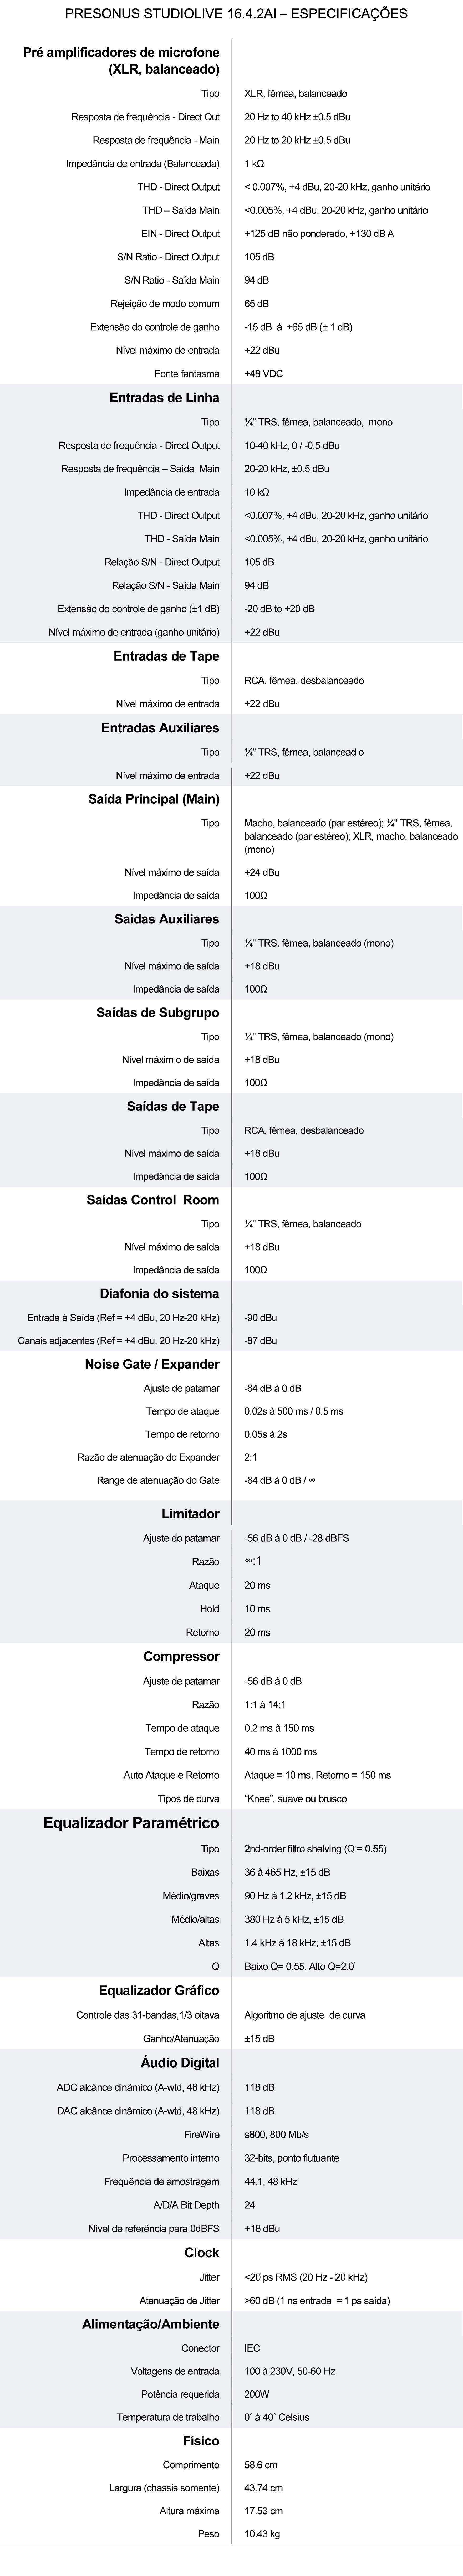 PRESONUS-STUDIOLIVE1642-SPECS-1